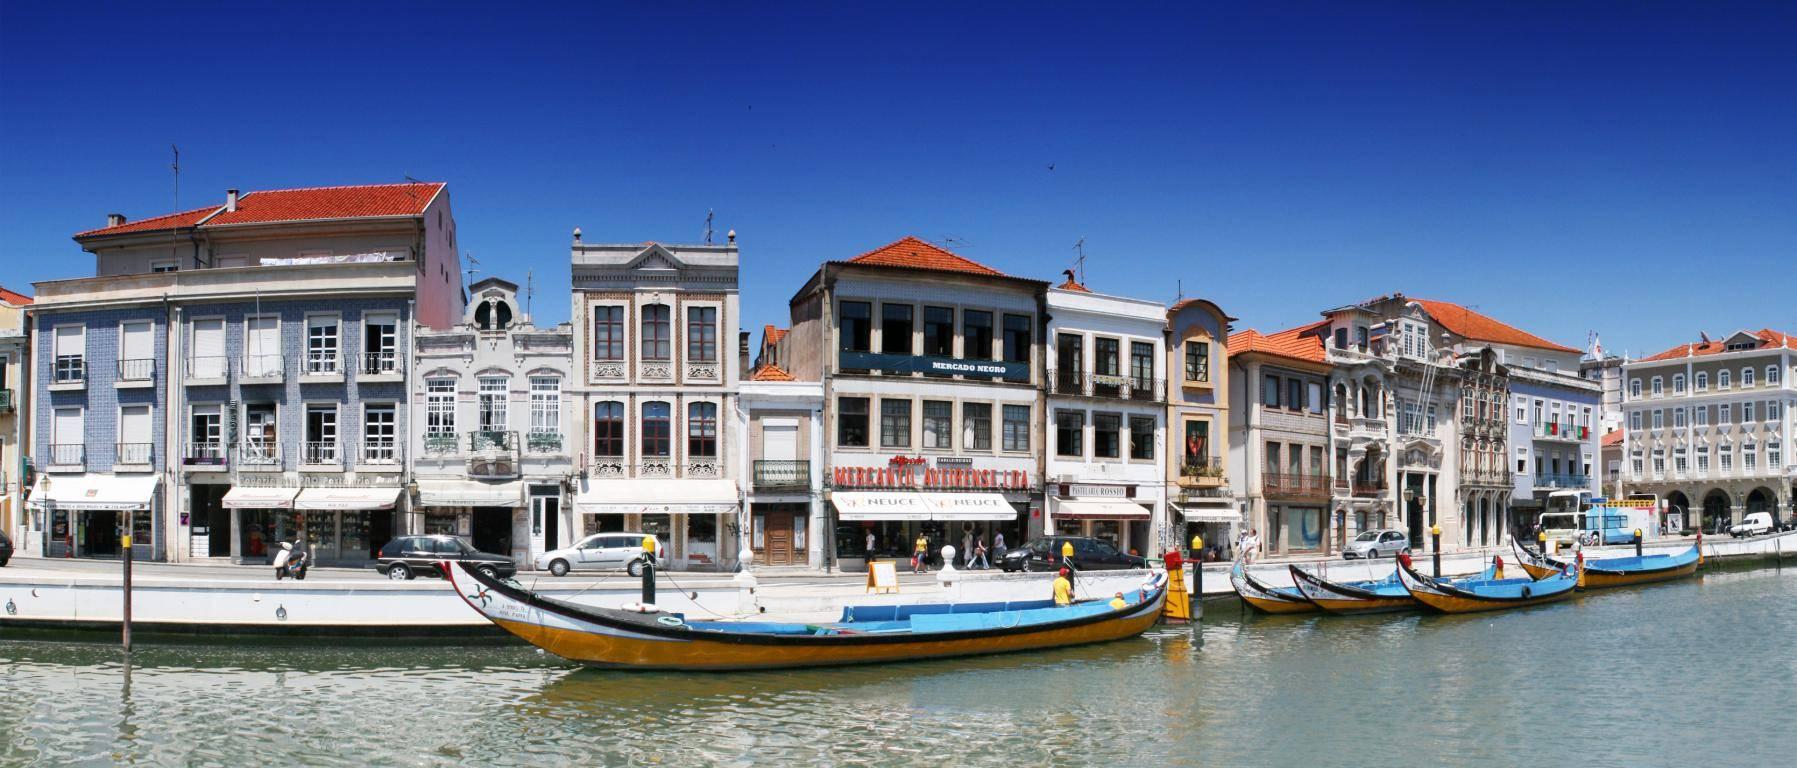 pueblos pintorescos de Portugal aveiro